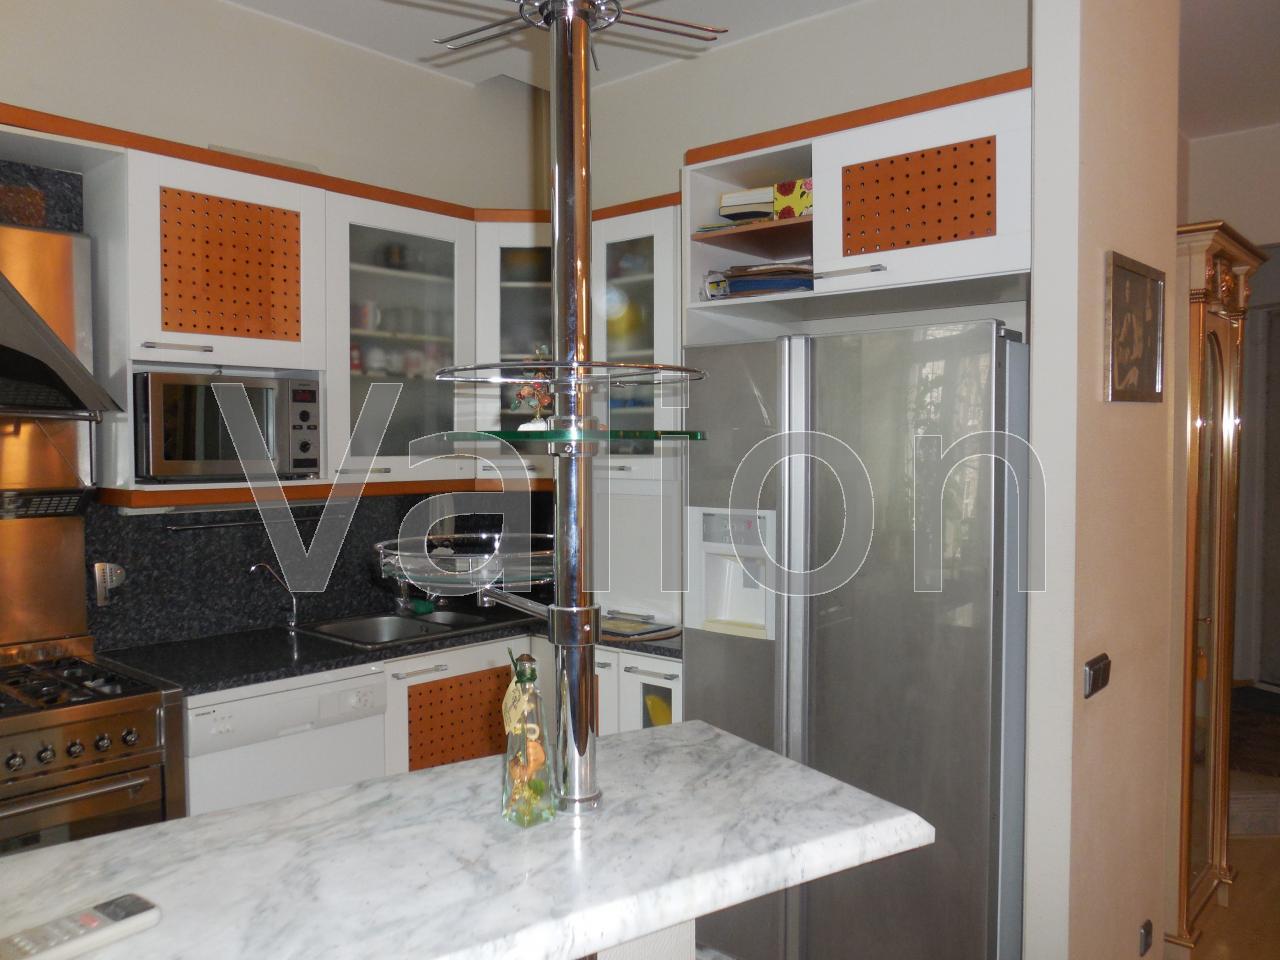 Продам квартиру Харьков, Пушкинский въезд 5